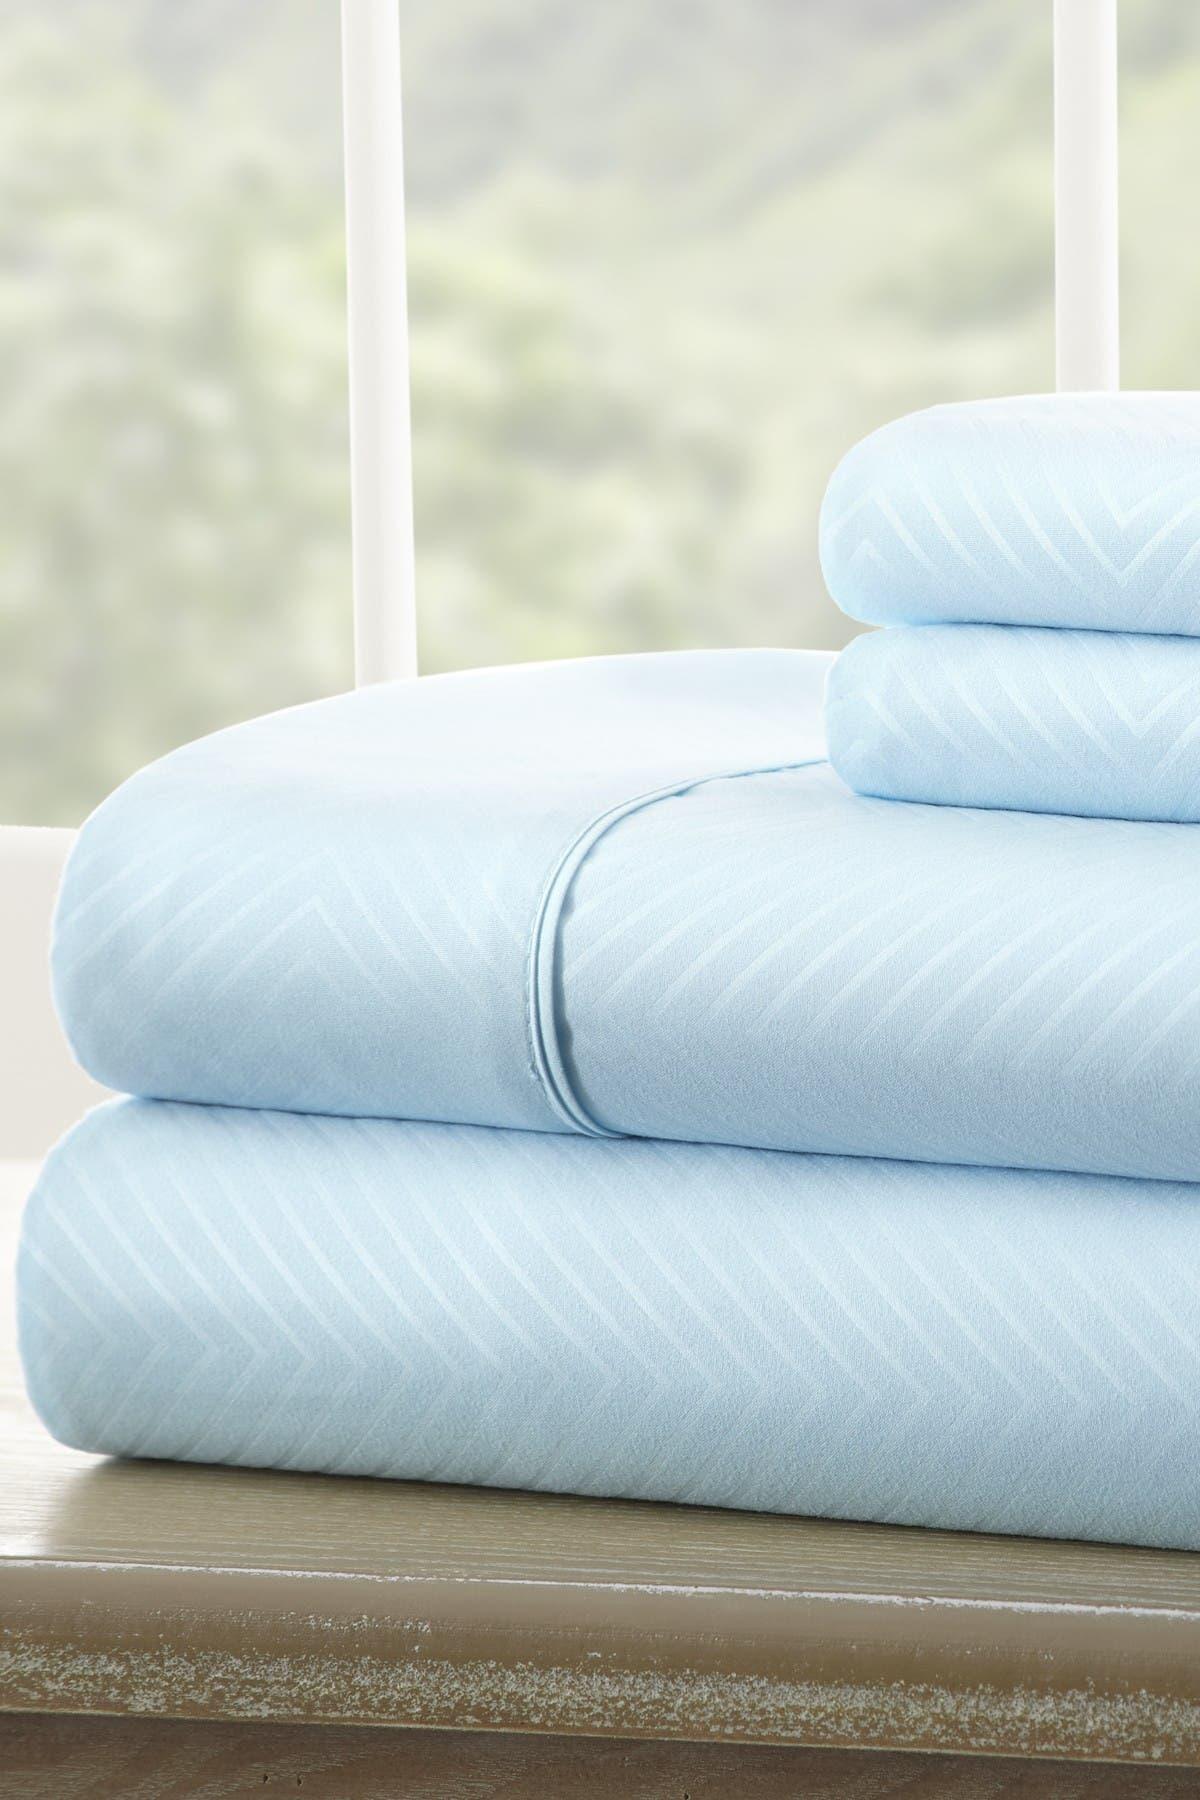 Image of IENJOY HOME California King Hotel Collection Premium Ultra Soft 4-Piece Chevron Bed Sheet Set - Aqua